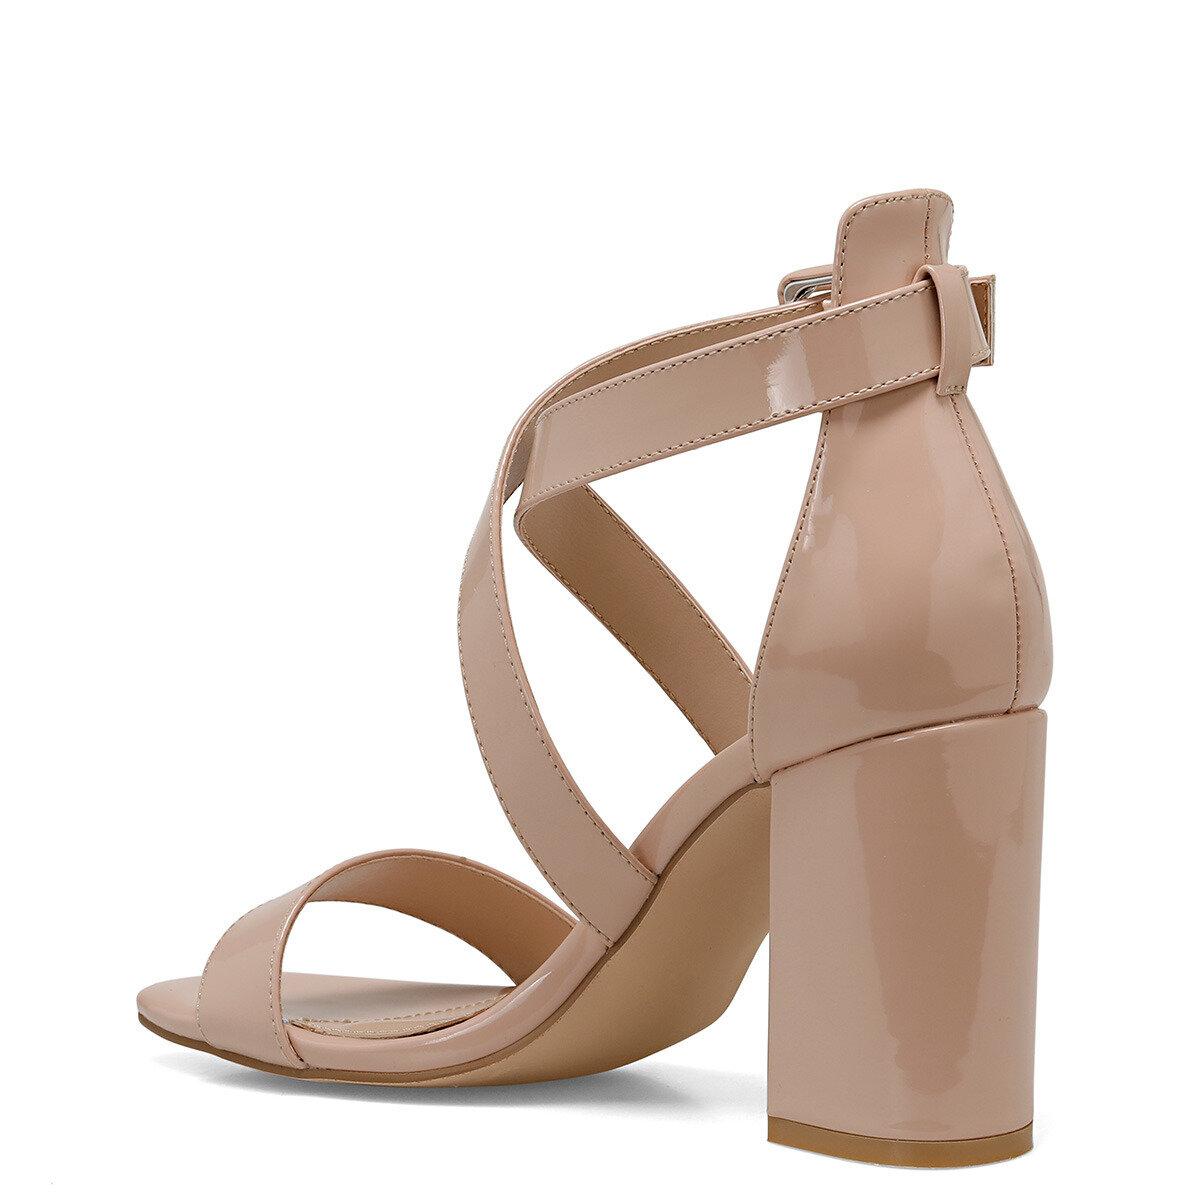 LAURA Naturel Kadın Topuklu Ayakkabı